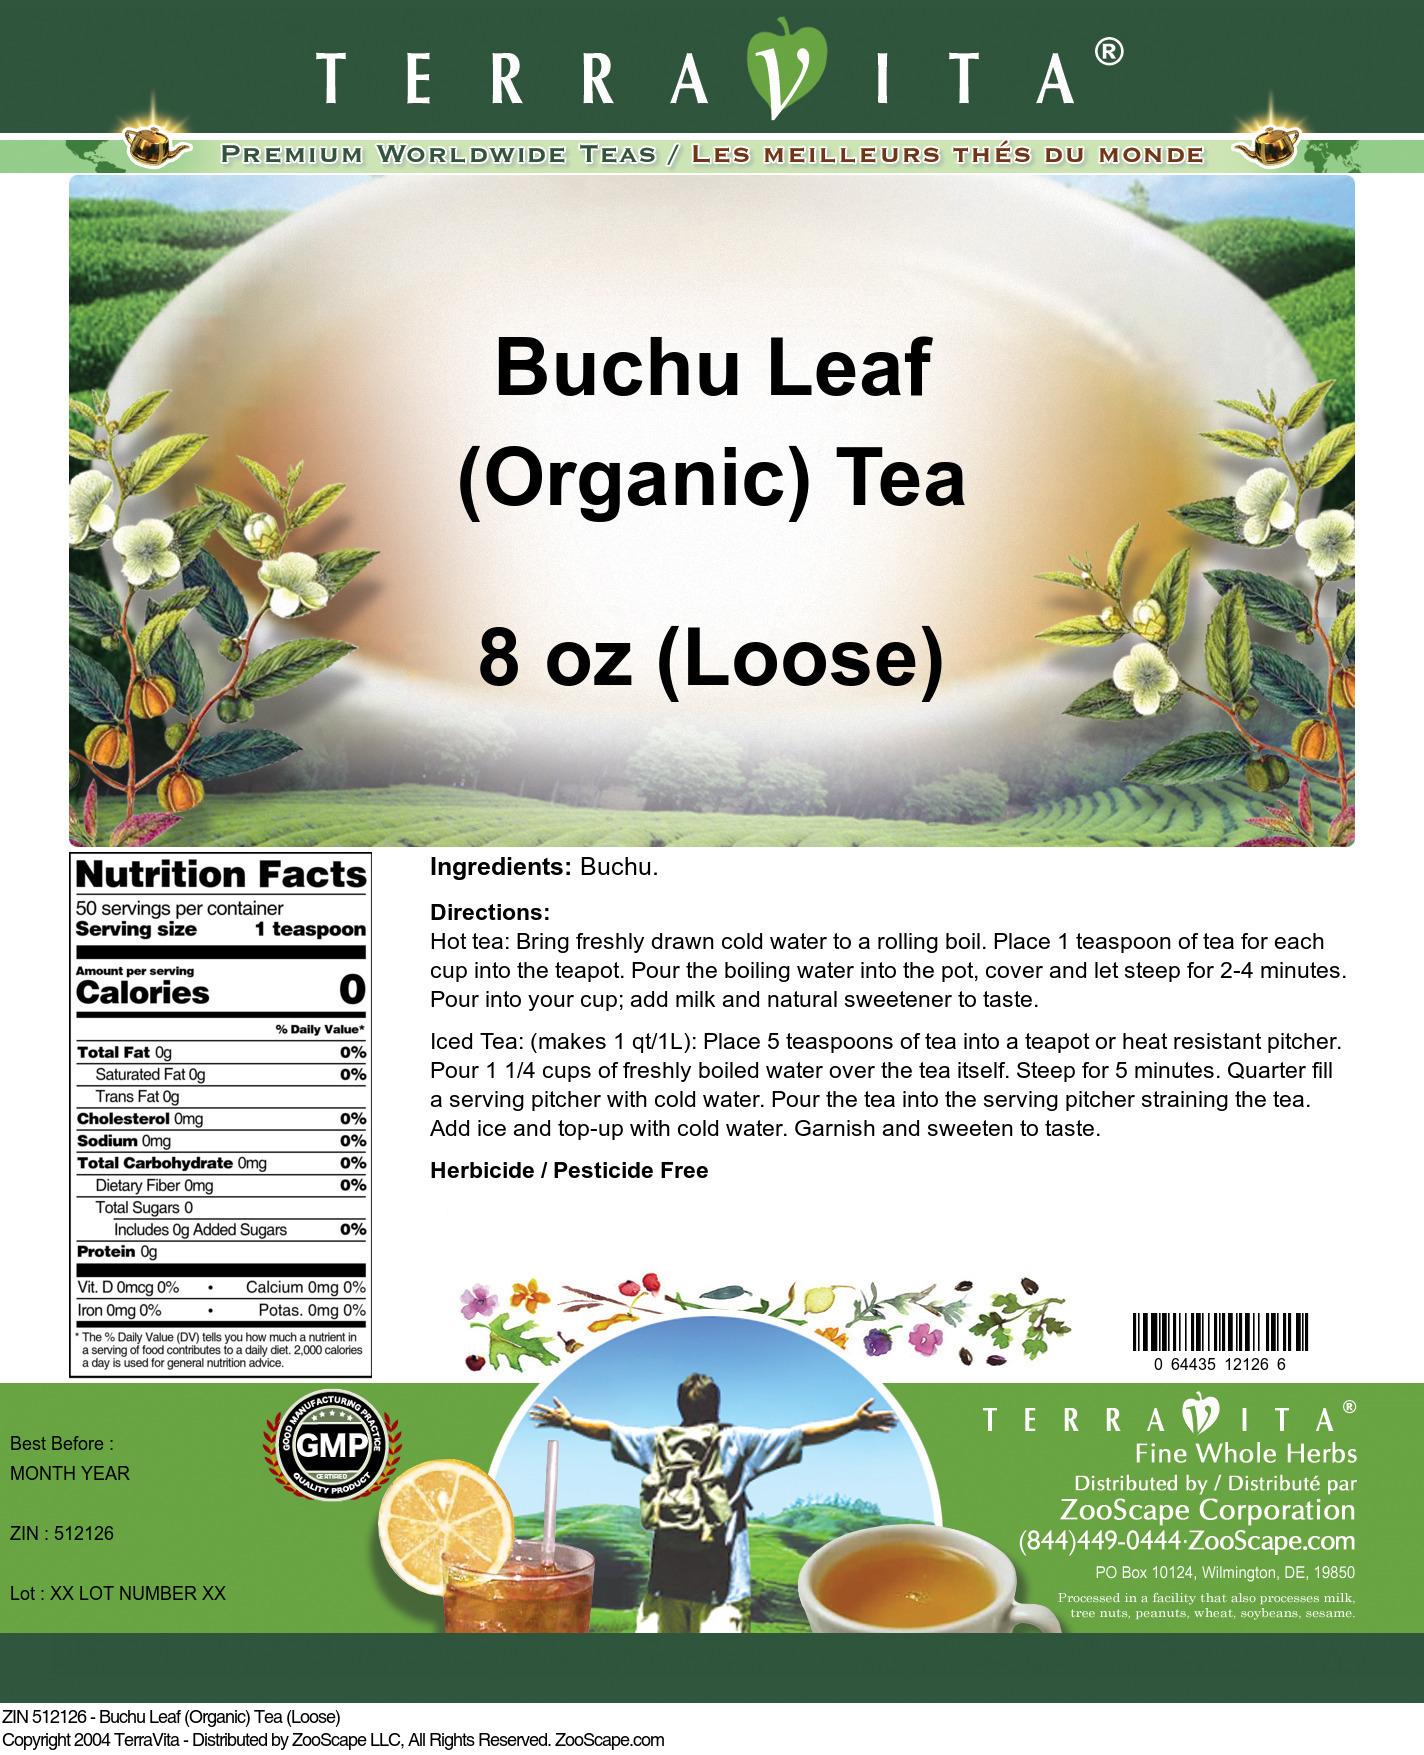 Buchu Leaf (Organic) Tea (Loose)